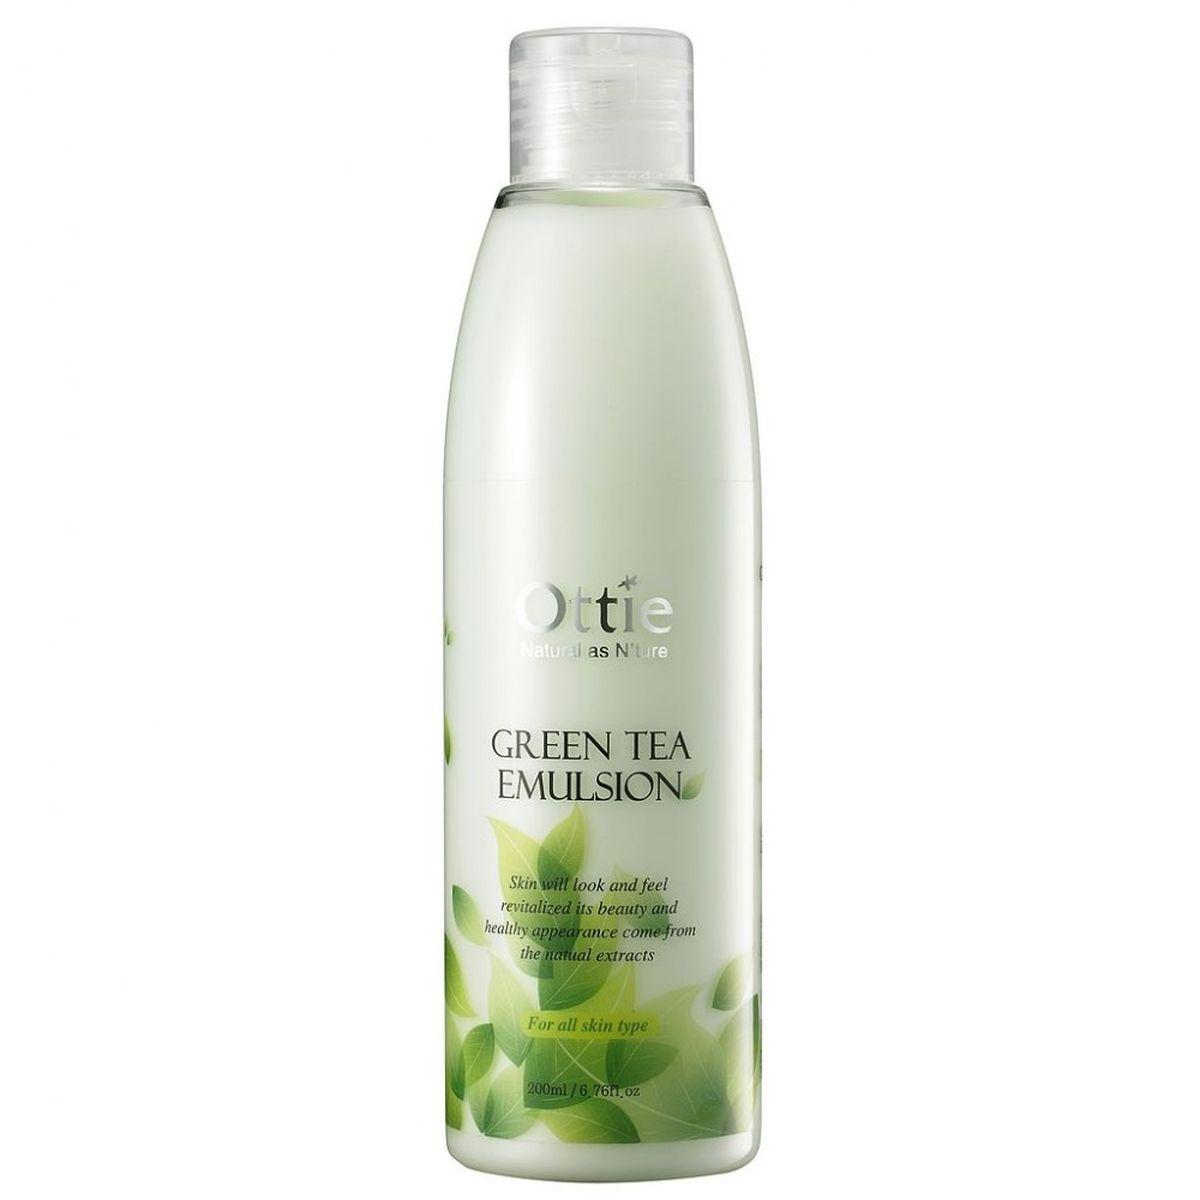 Эмульсия для лица с зеленым чаем Ottie Green Tea Emulsion - 200 мл